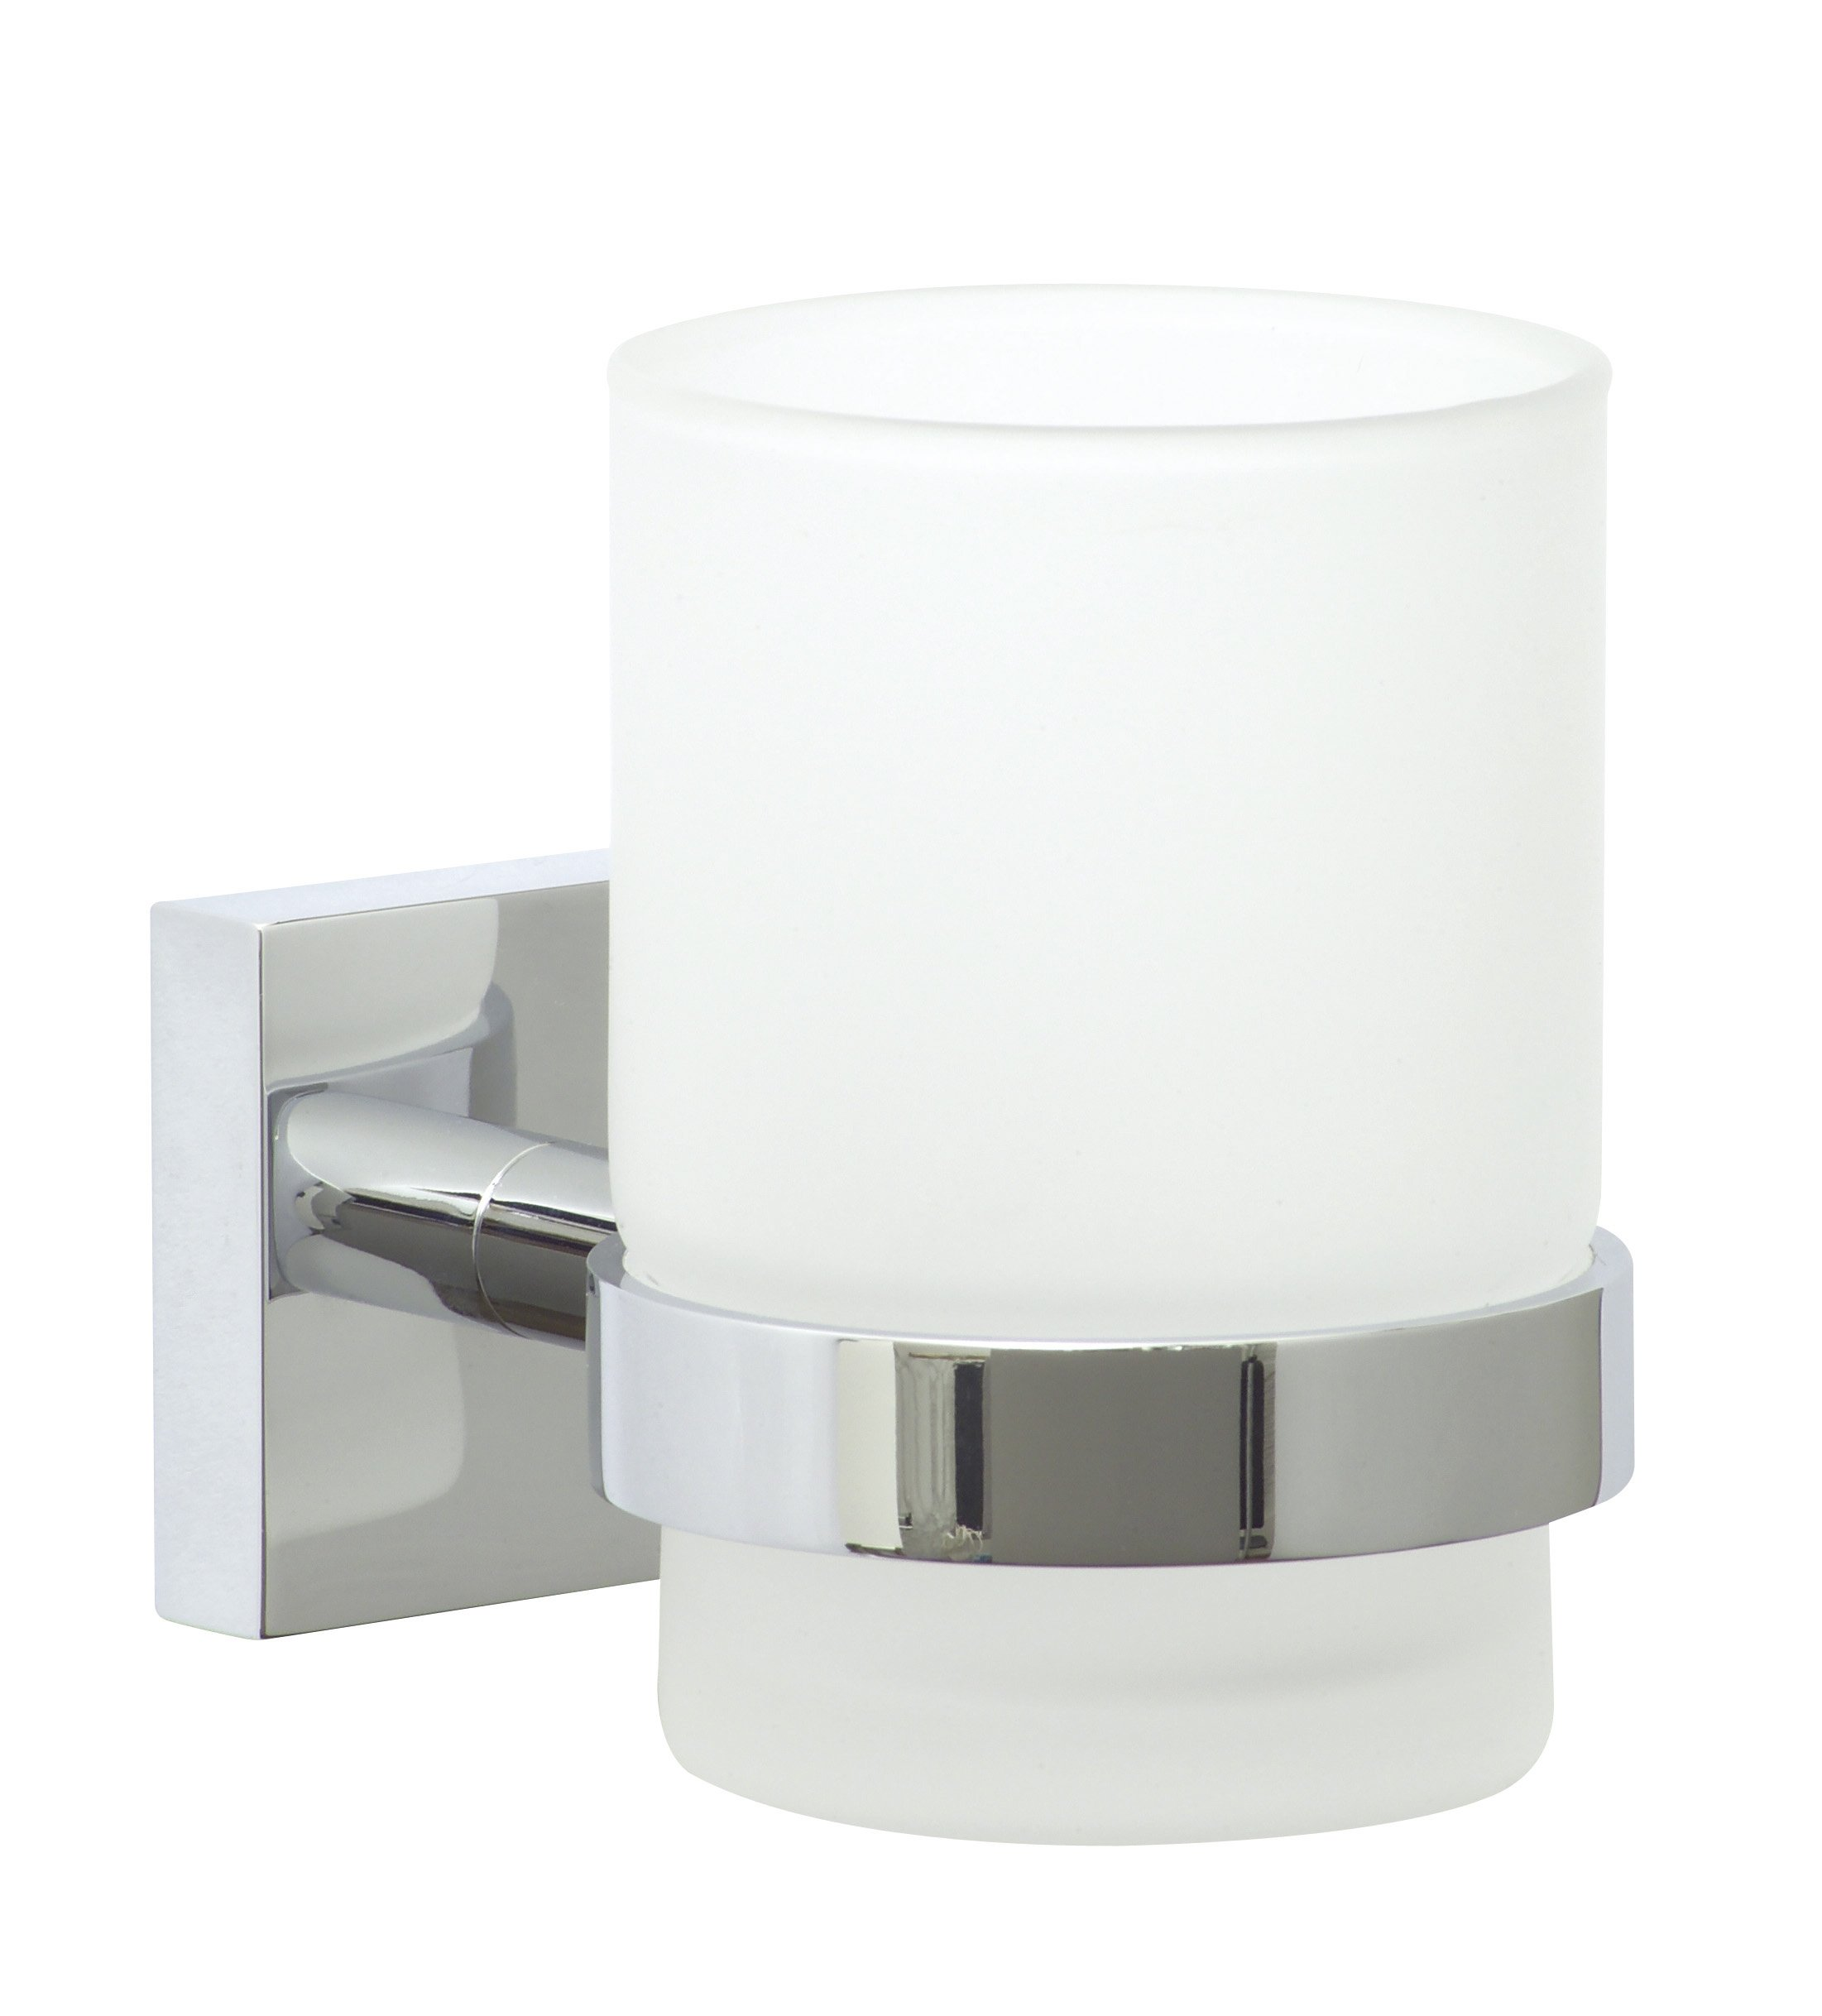 nie wieder bohren Ekkro EK145 Toothbrush Glass Holder 6.7 x 11 x 9.5 cm Chromed with Mounting Technology by nie wieder bohren